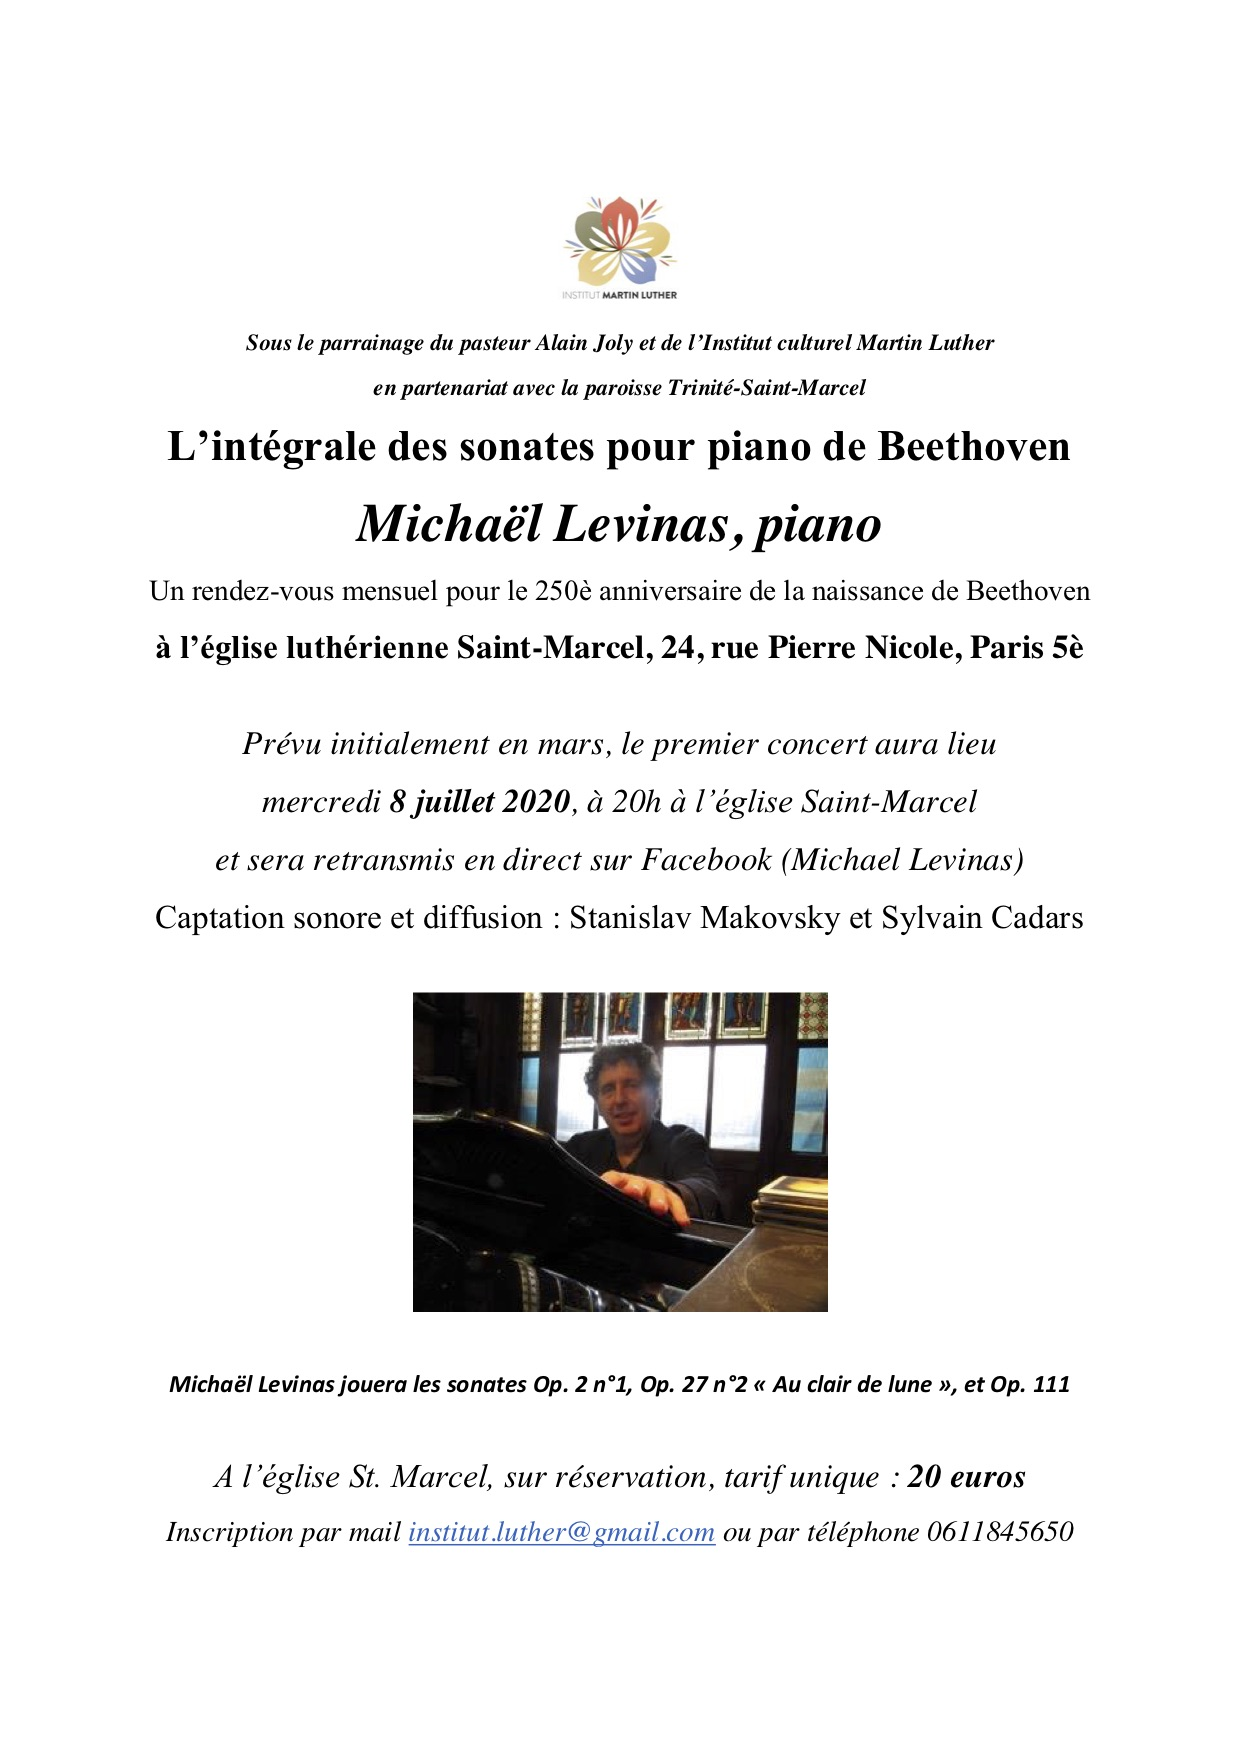 Beethoven Levinas 8 juillet 2020